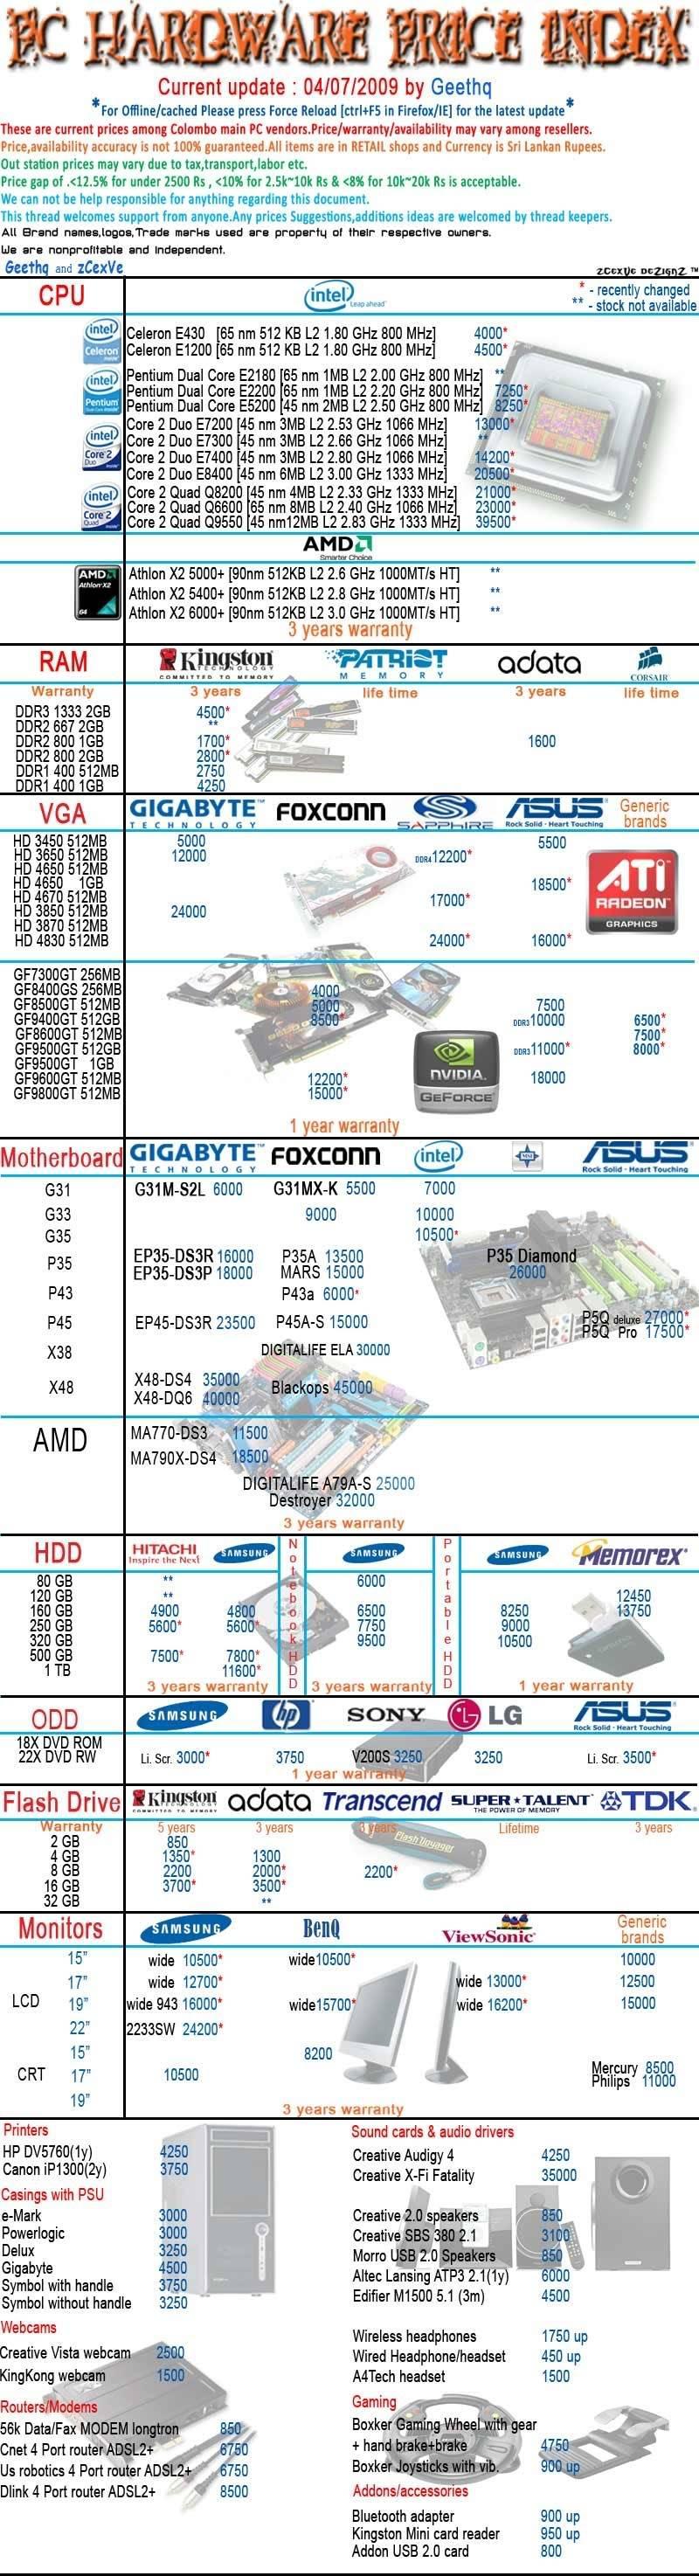 Sri Lankan Local Market PC Hardware Price Index (current update 10/02/2009) Price-list